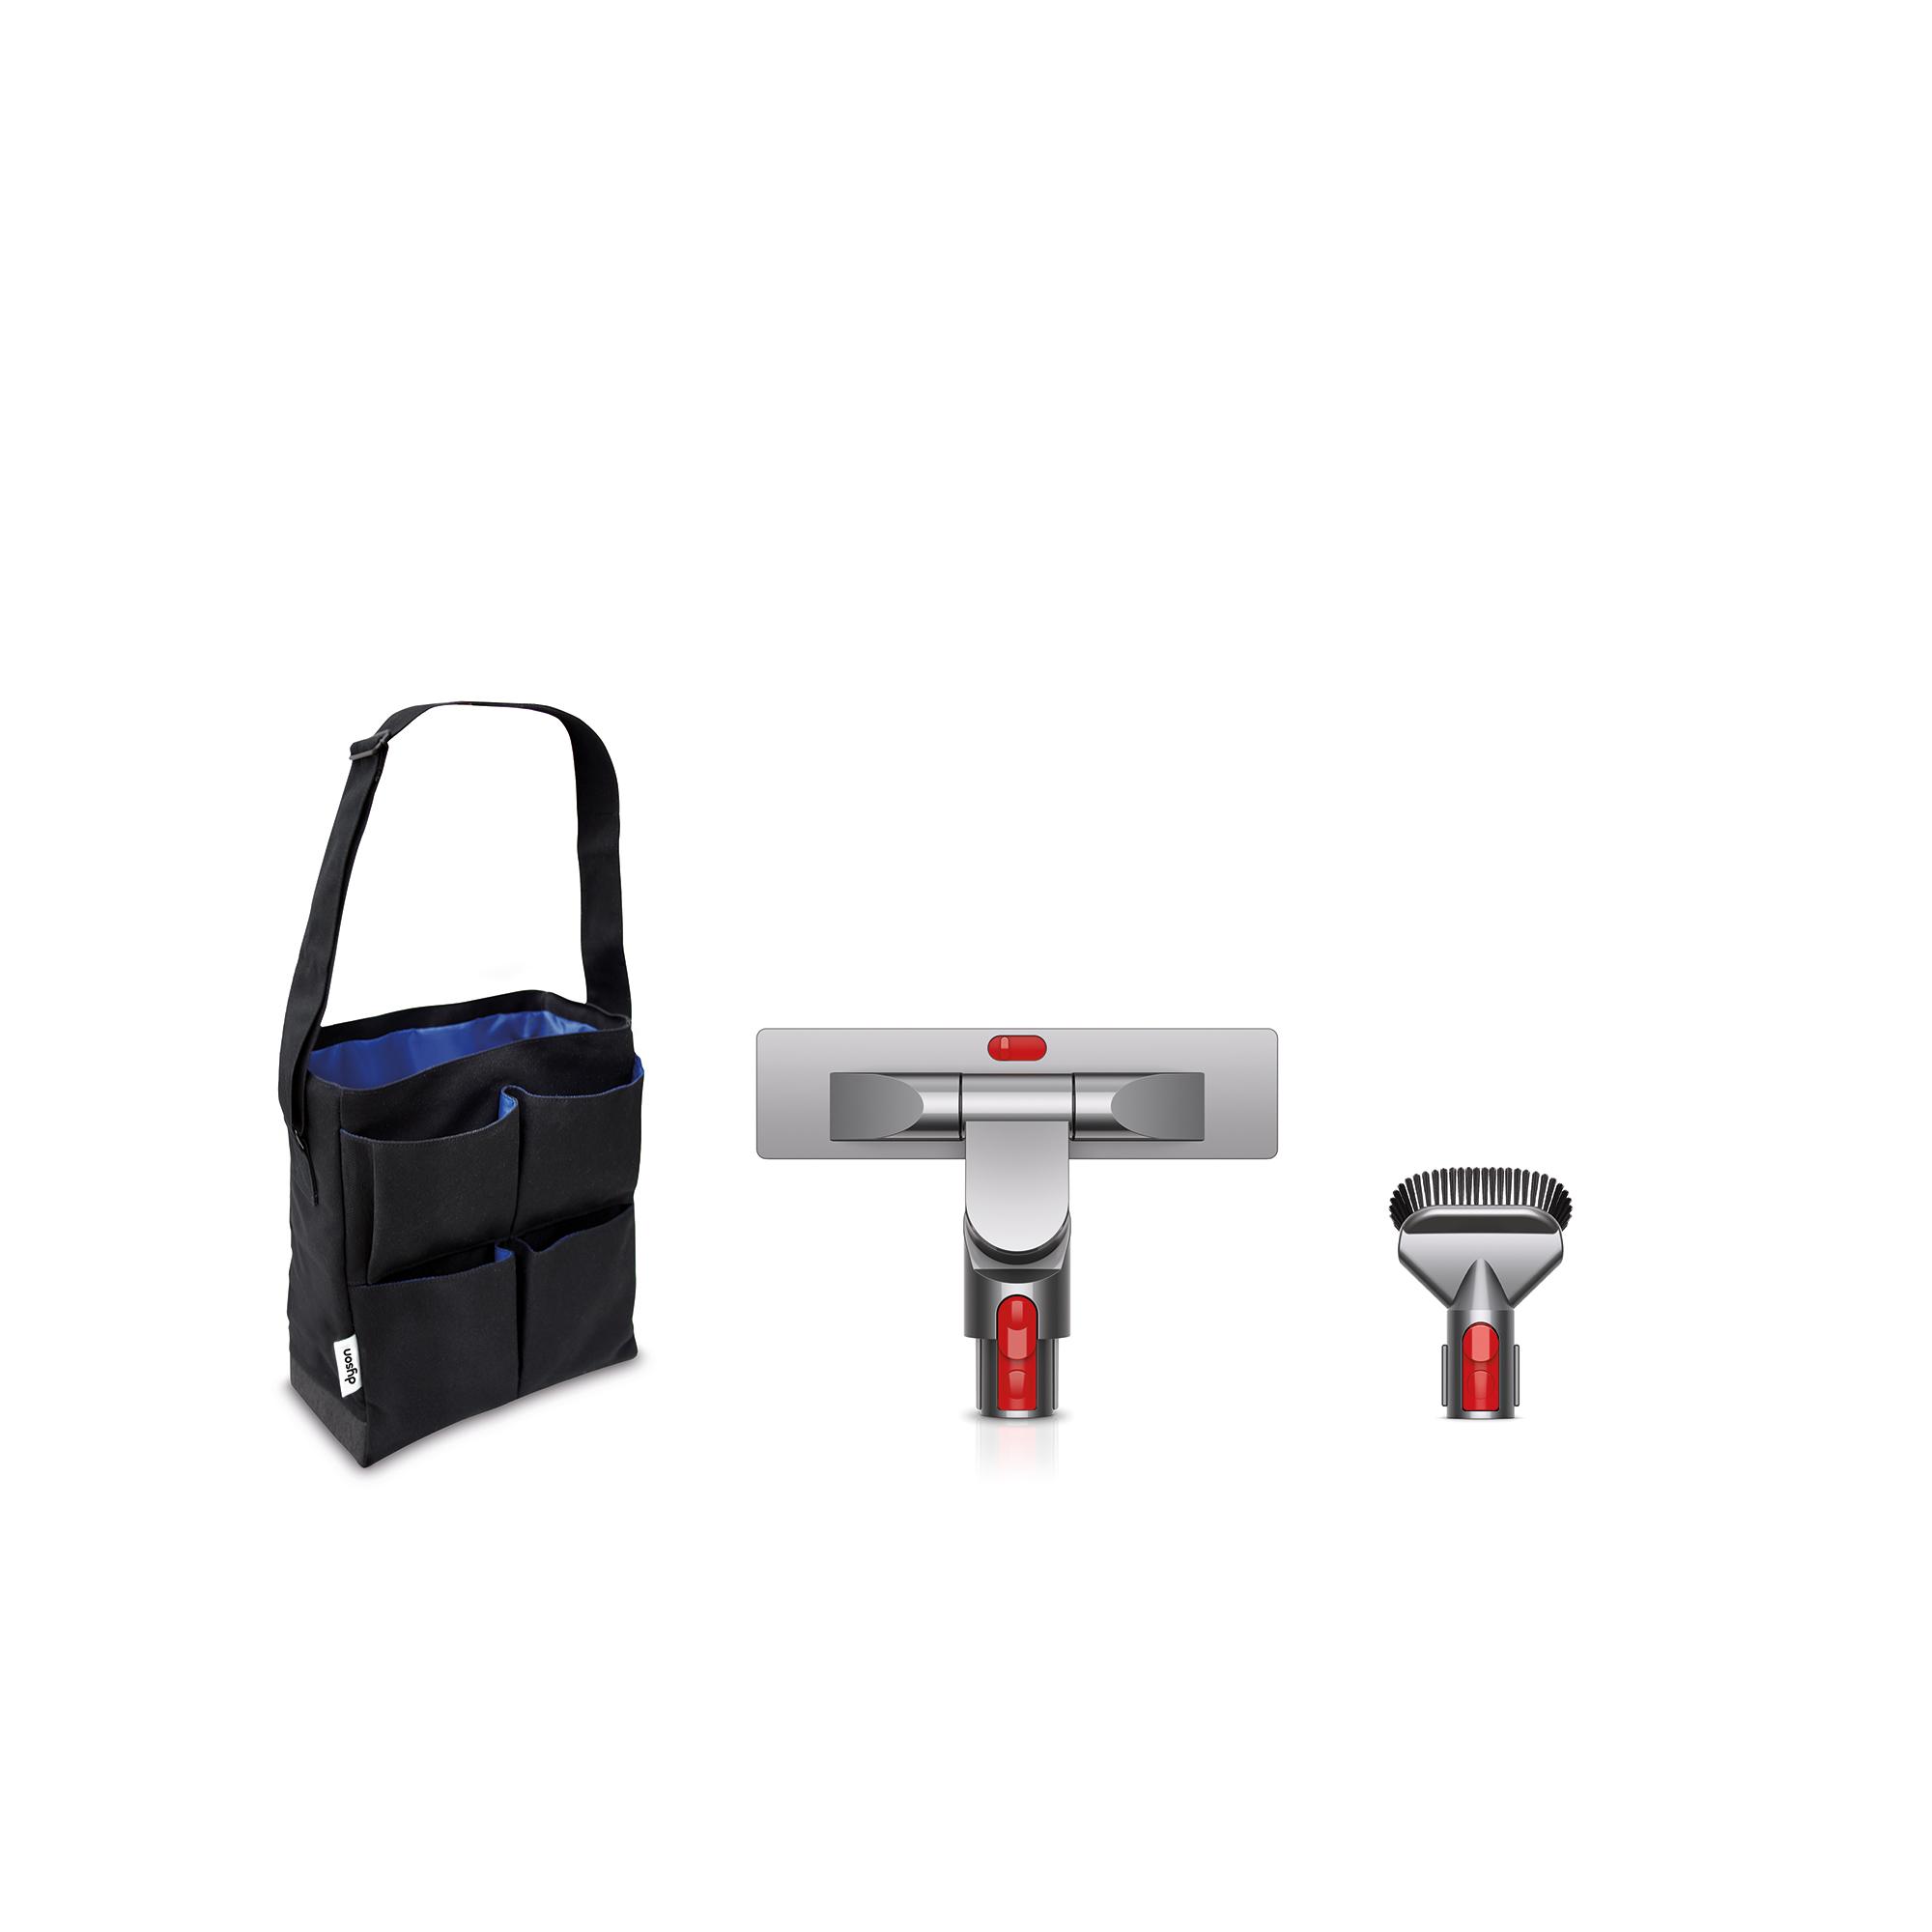 Dyson-V7-Animal-Cordless-HEPA-Vacuum-with-Bonus-Tools-New thumbnail 8